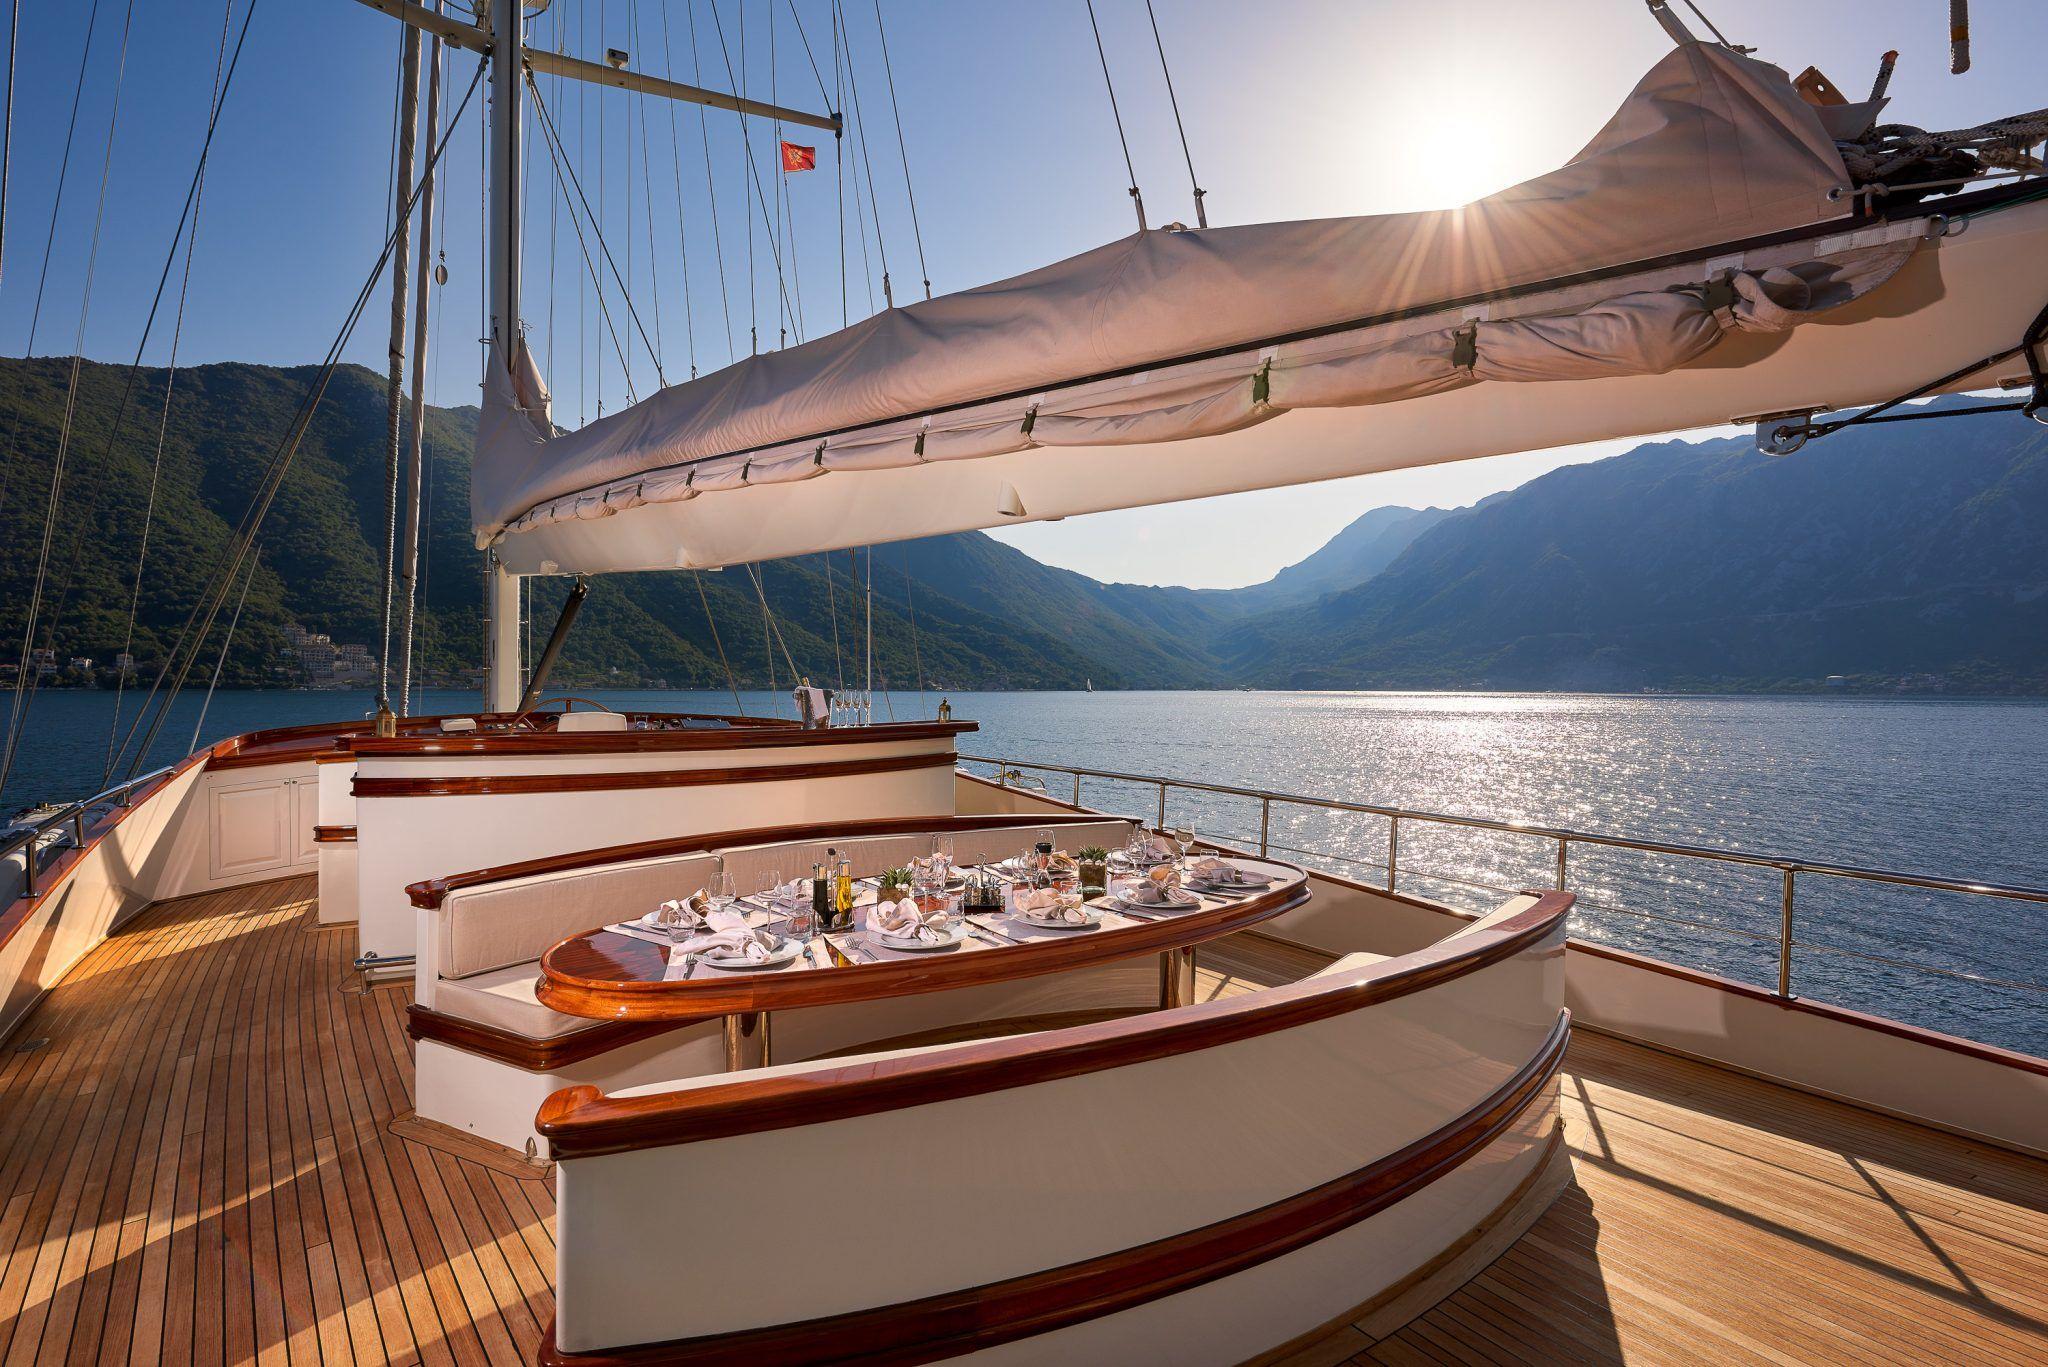 S/Y RIANA Yacht for Charter alfresco deck